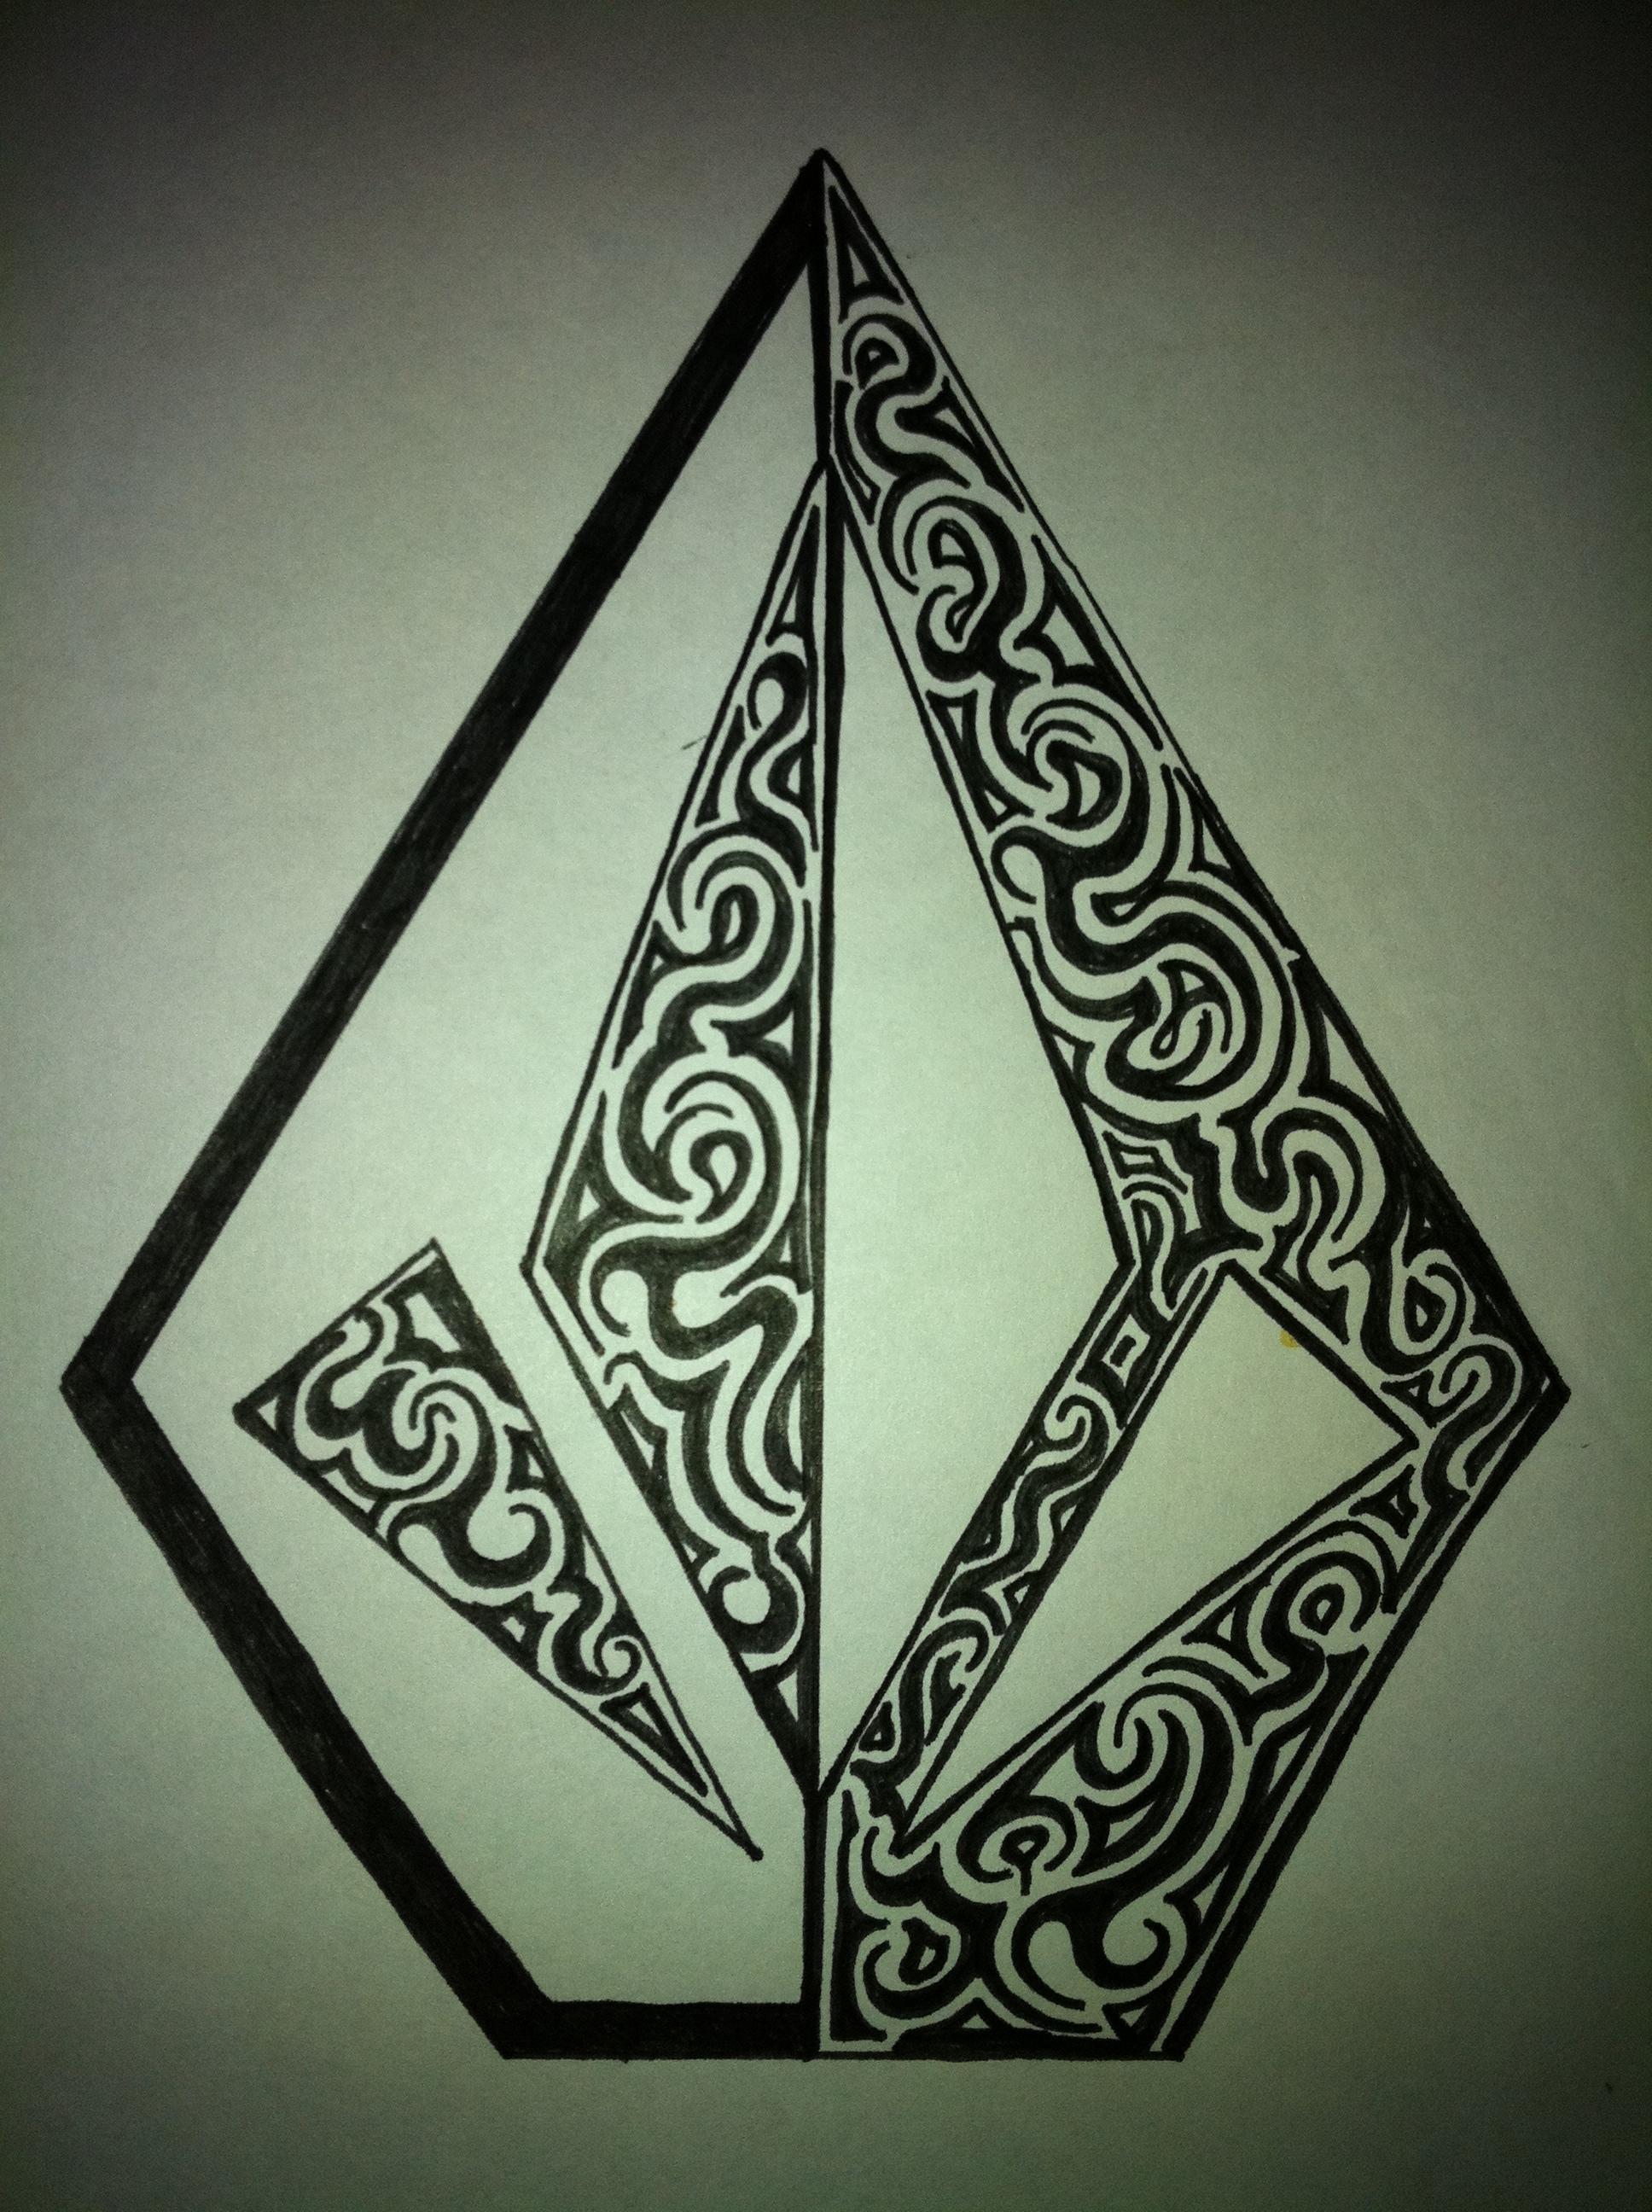 Volcom Logos